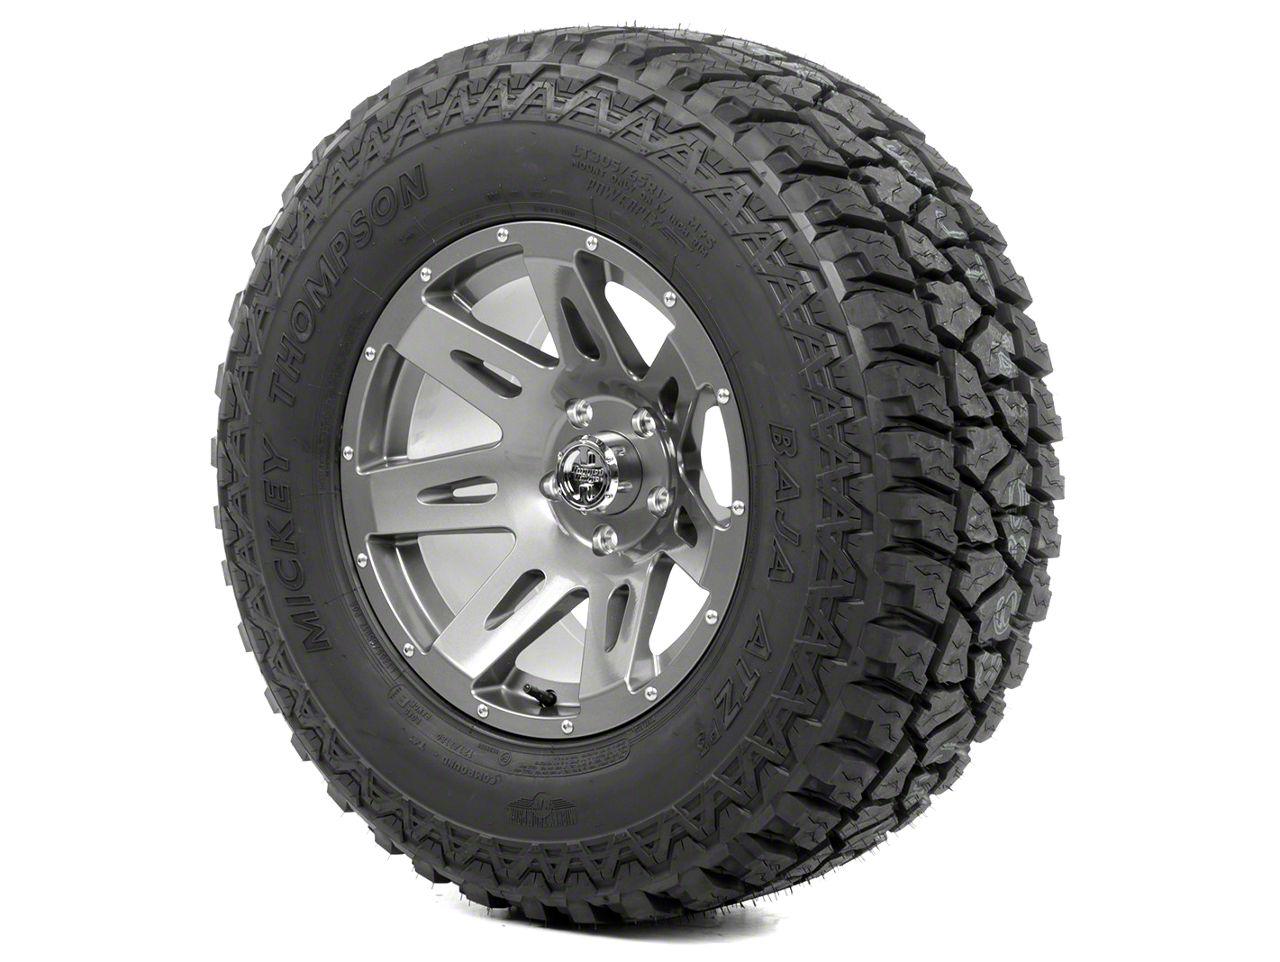 Rugged Ridge XHD Wheel 17x9 Gun Metal and Mickey Thompson ATZ P3 305/65R17 Tire Kit (13-18 Jeep Wrangler JK; 2018 Jeep Wrangler JL)